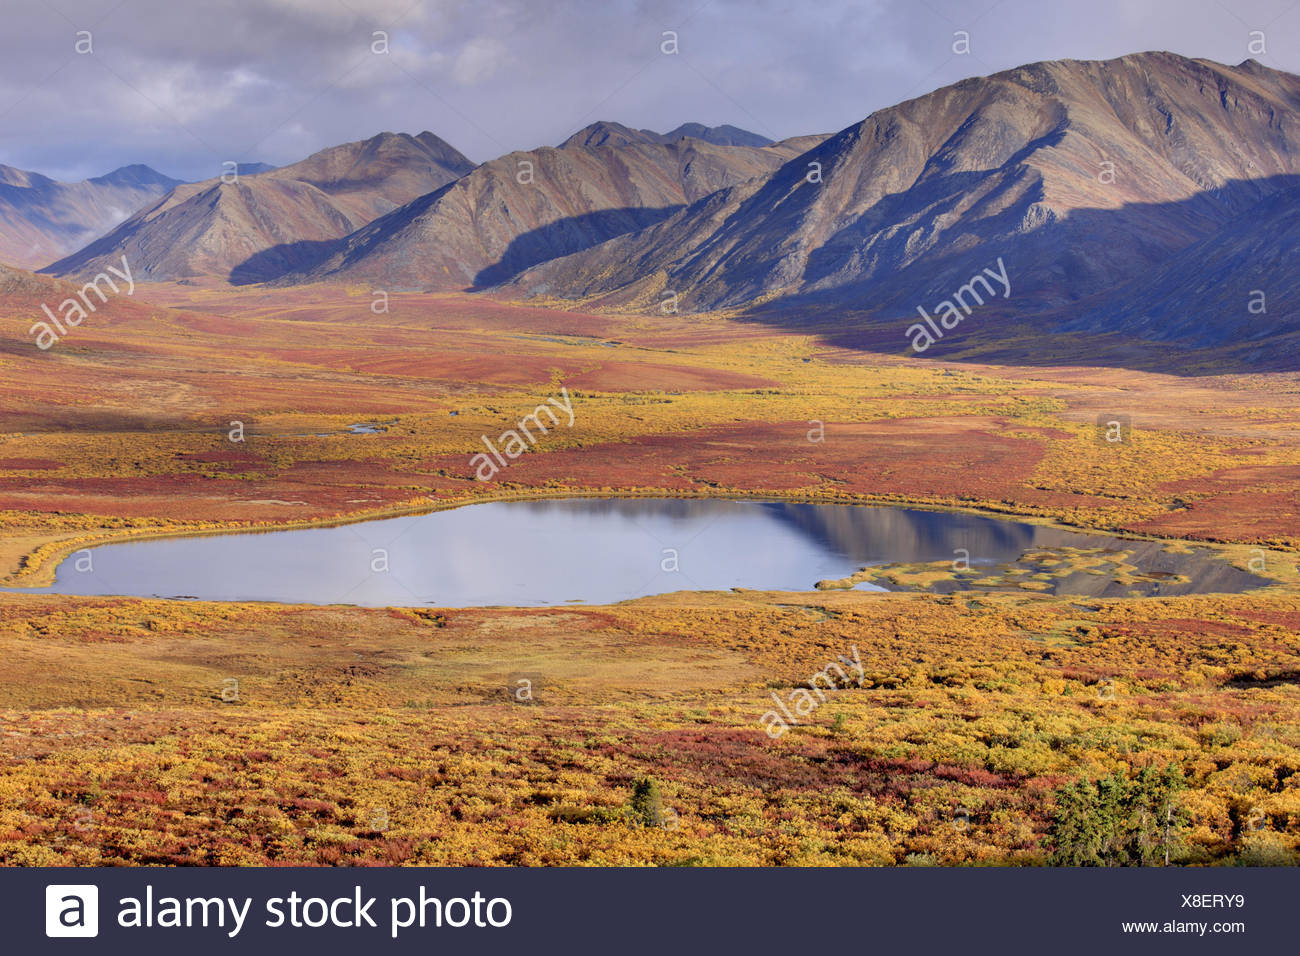 North America, Canada, Yukon territory, Yukon Territory, Dempster highway, Ogilvie Mountains, Tombstone Territorial park, lake, autumn, - Stock Image